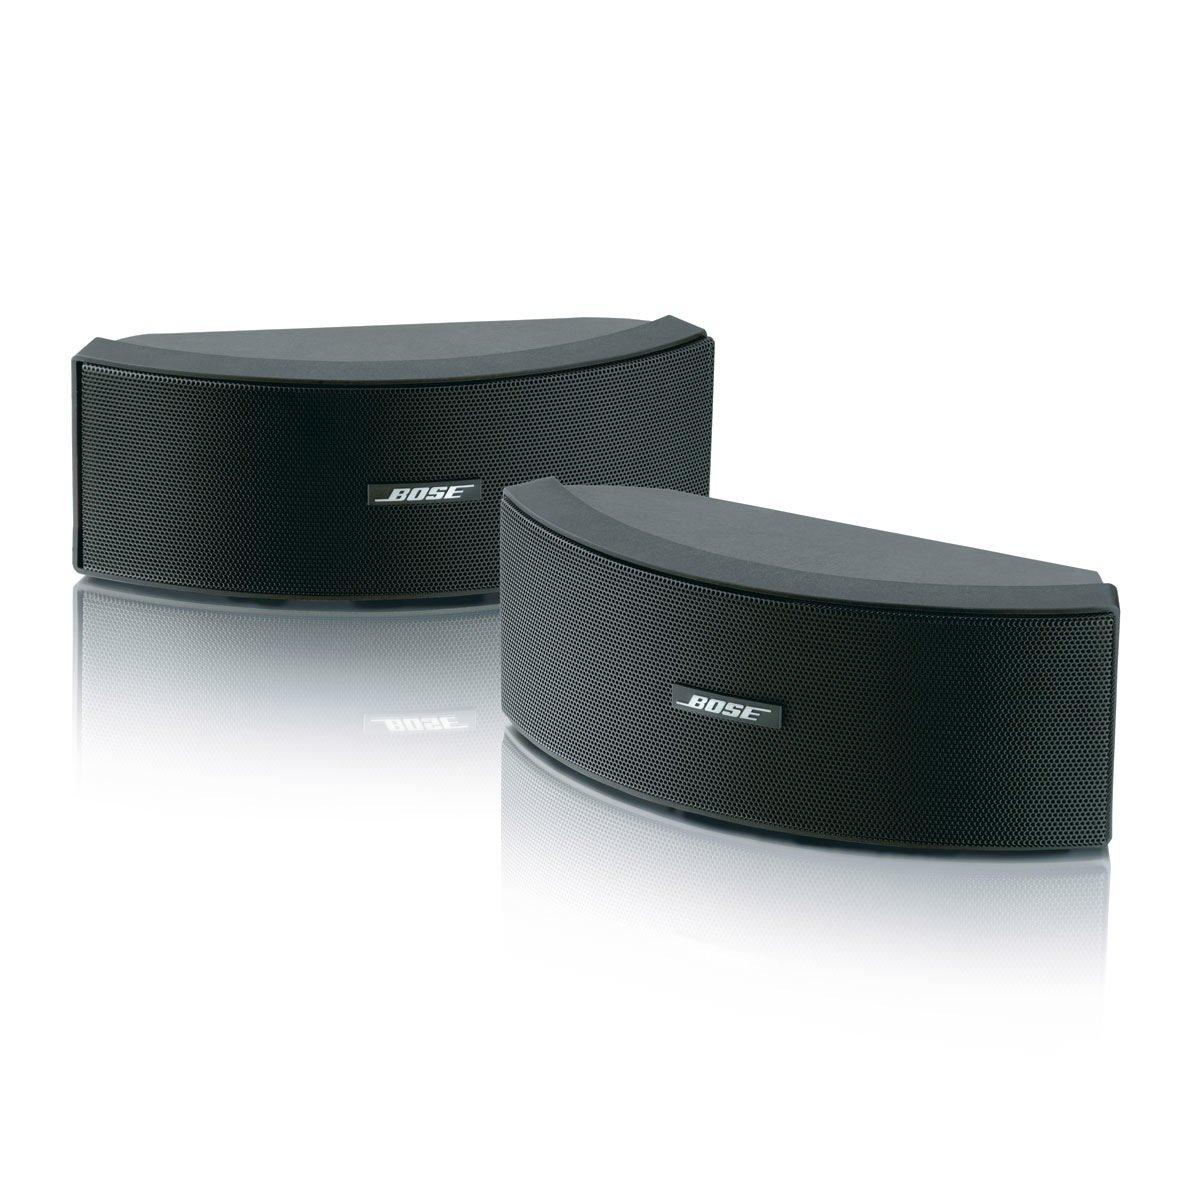 bose 151 outdoor speakers. amazon.com: bose 151 se environmental speakers, elegant outdoor speakers - black: home audio \u0026 theater